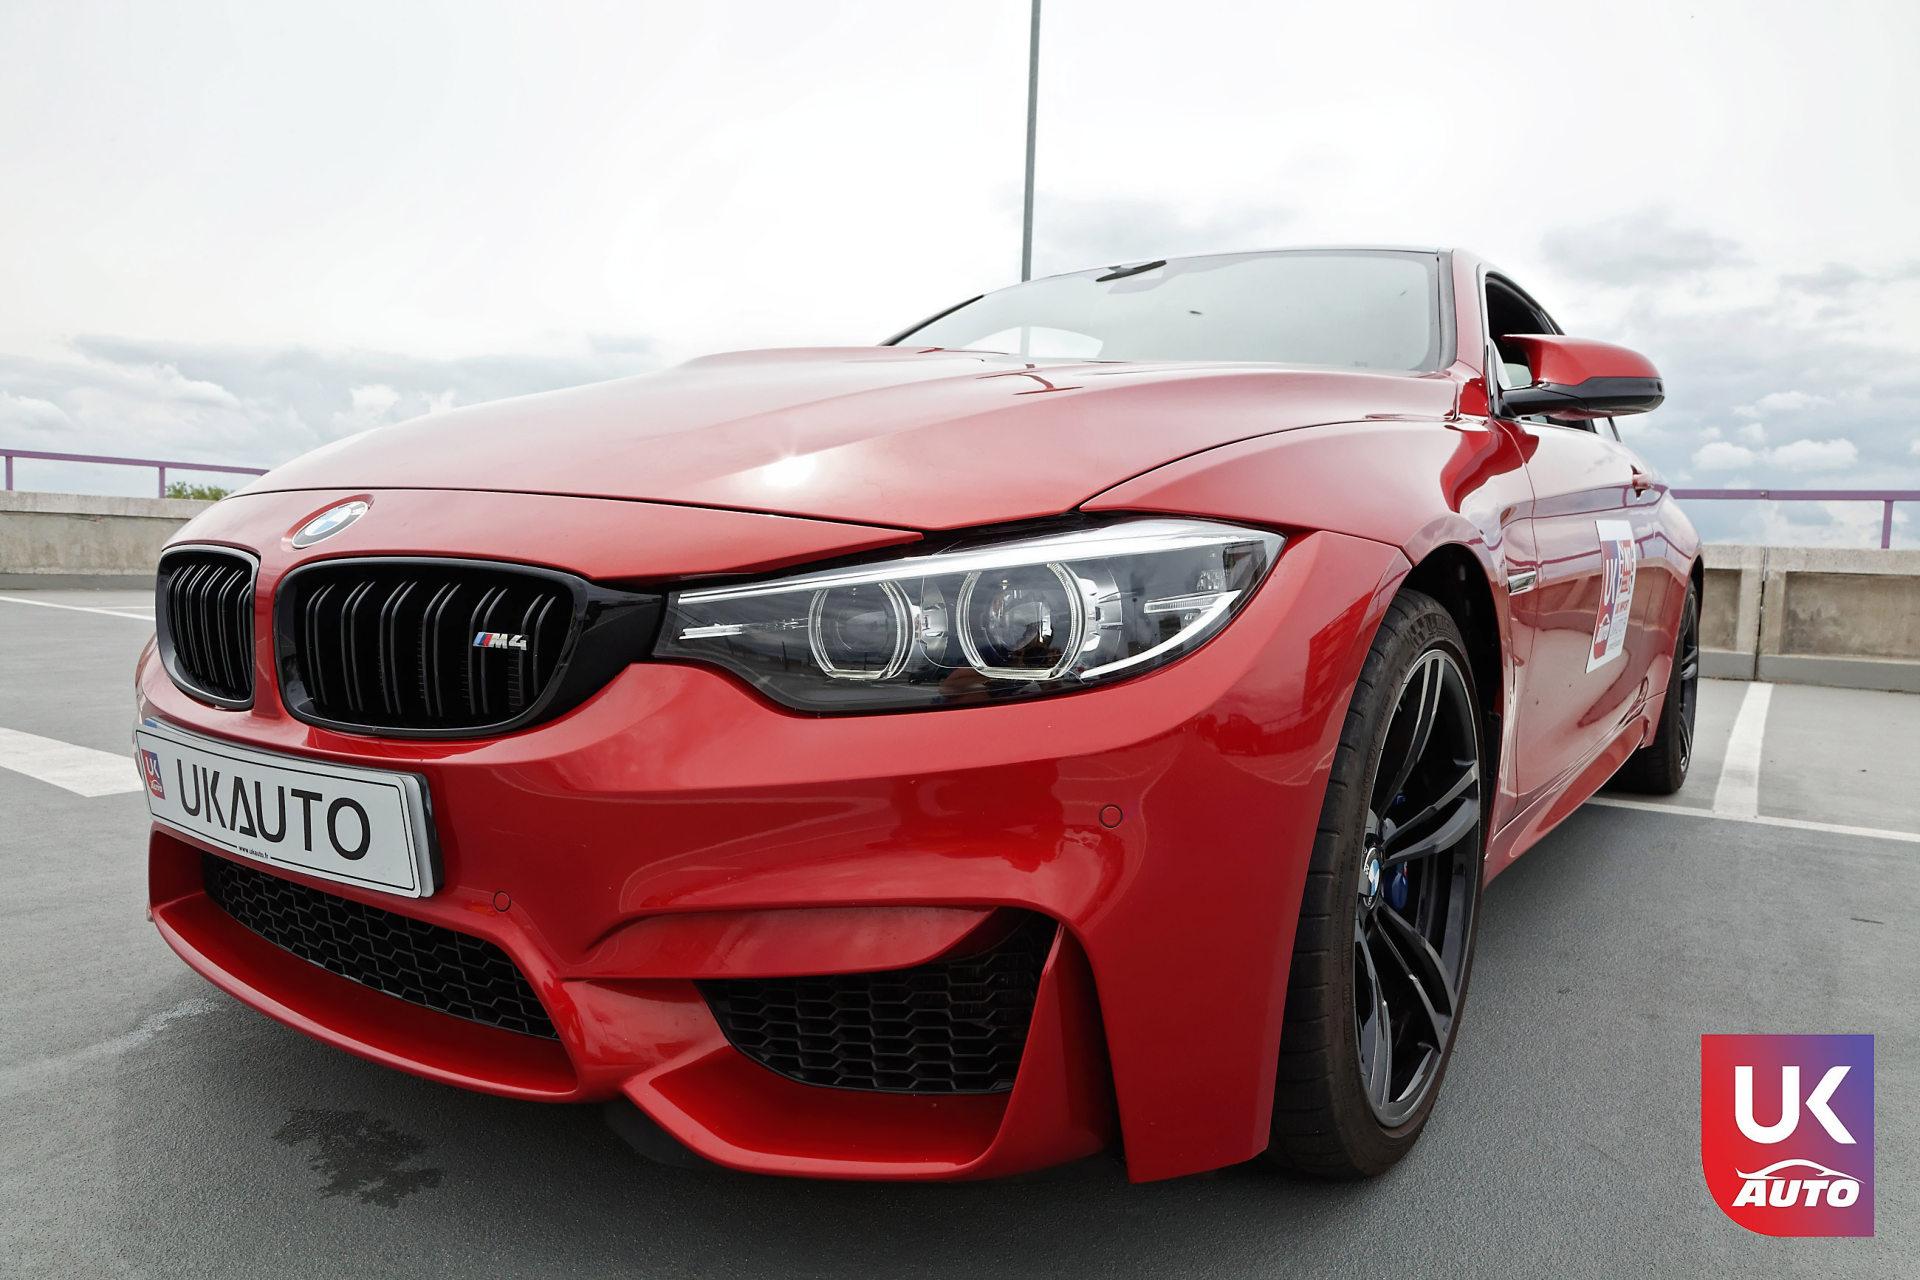 BMW M4 PACK COMPETITION BMW ANGLETERRE BMW IMPORT UK BMW MANDATAIRE AUTO5 DxO - IMPORTATION BMW M4 BMW IMPORT ROYAUME UNI BMW M4 COMPETITION RHD CLIENT UKAUTO